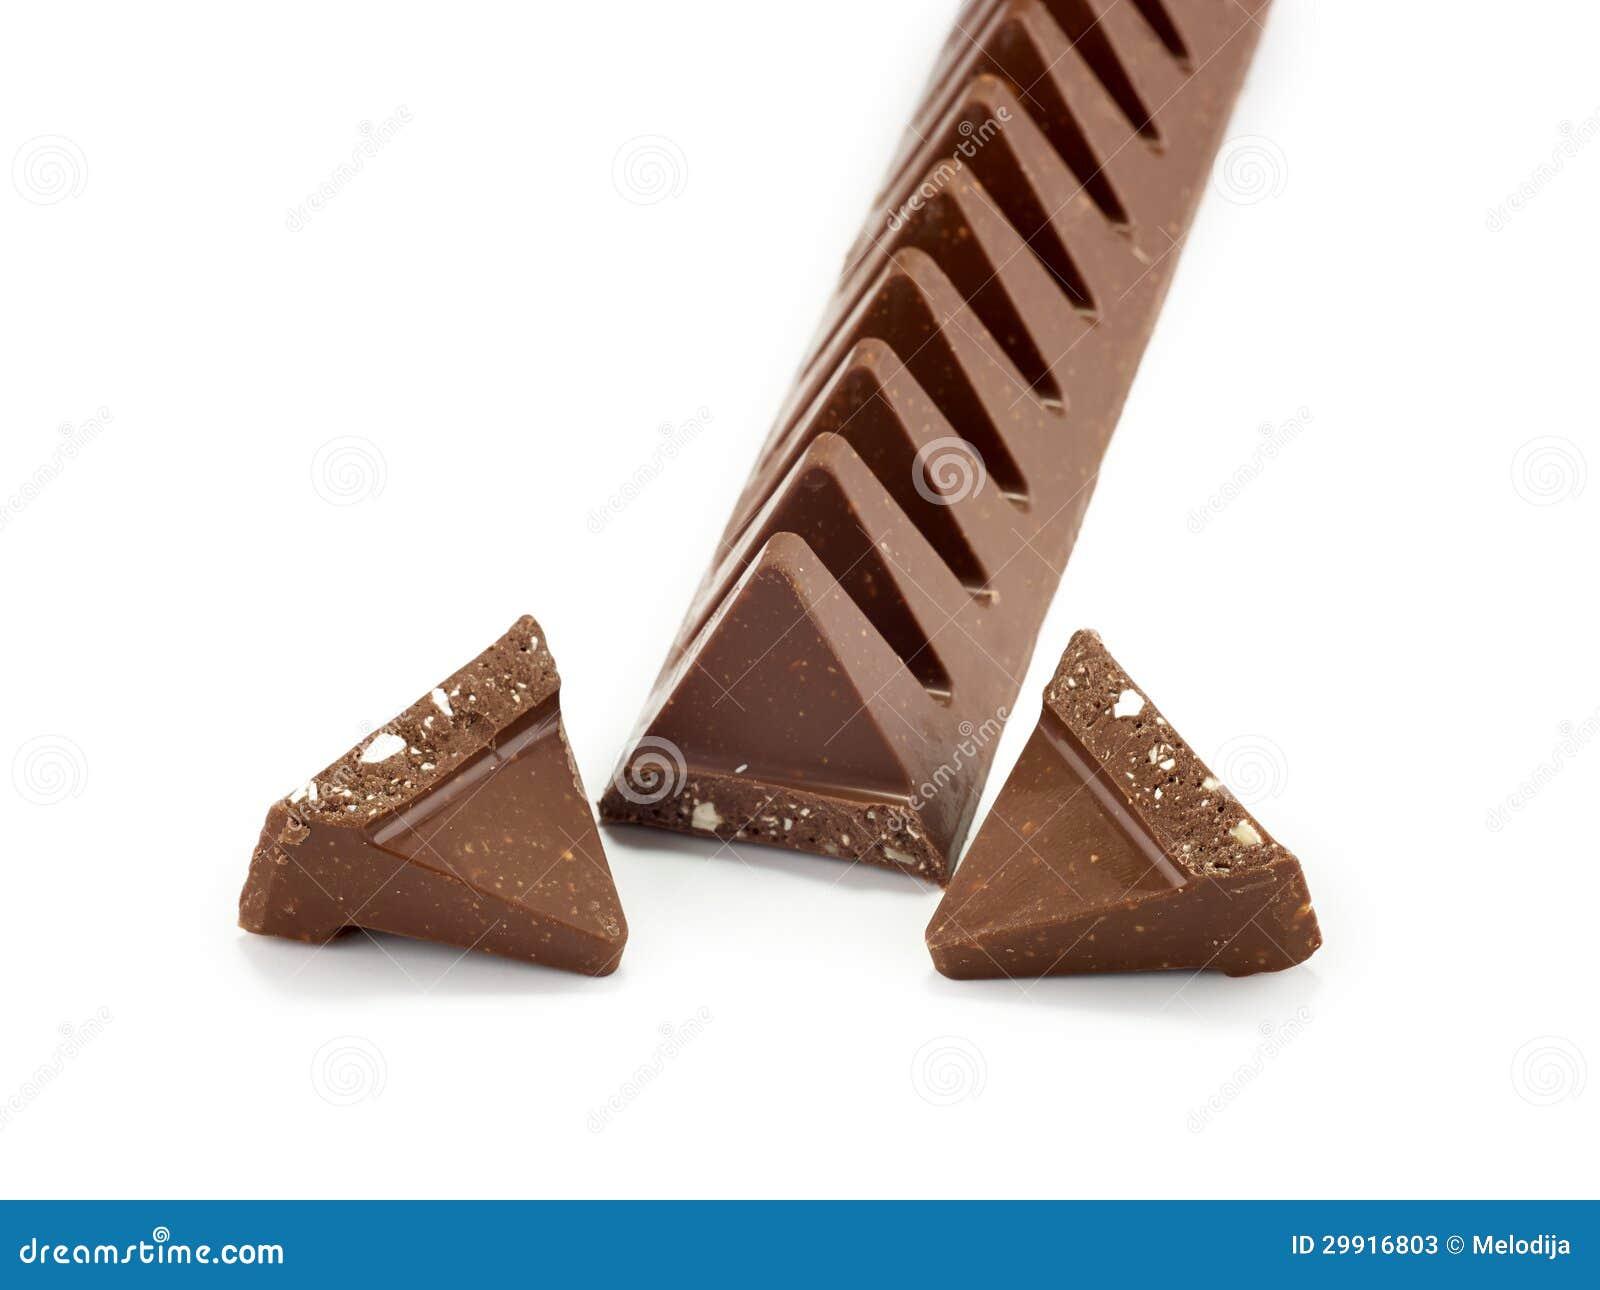 Chocolate Bar In Pyramid Shape Stock Photos Image 29916803